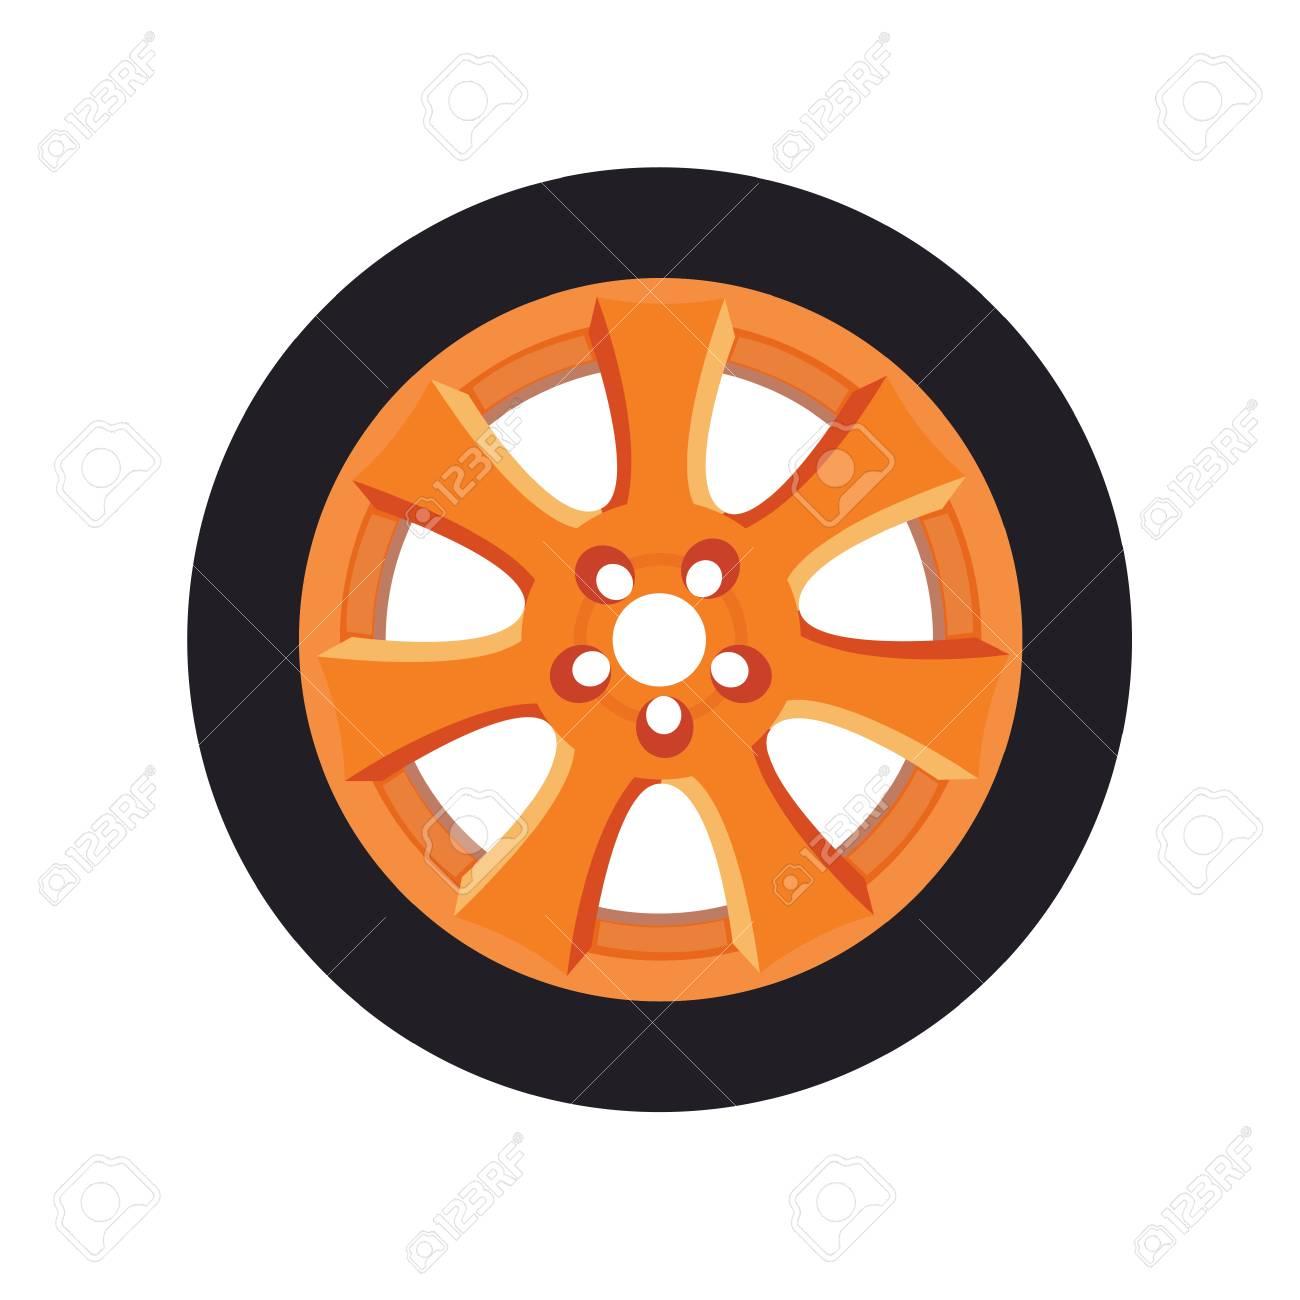 Beautiful Cartoon Detailed Orange Car Wheel Vector Illustration Royalty Free Cliparts Vectors And Stock Illustration Image 114297448